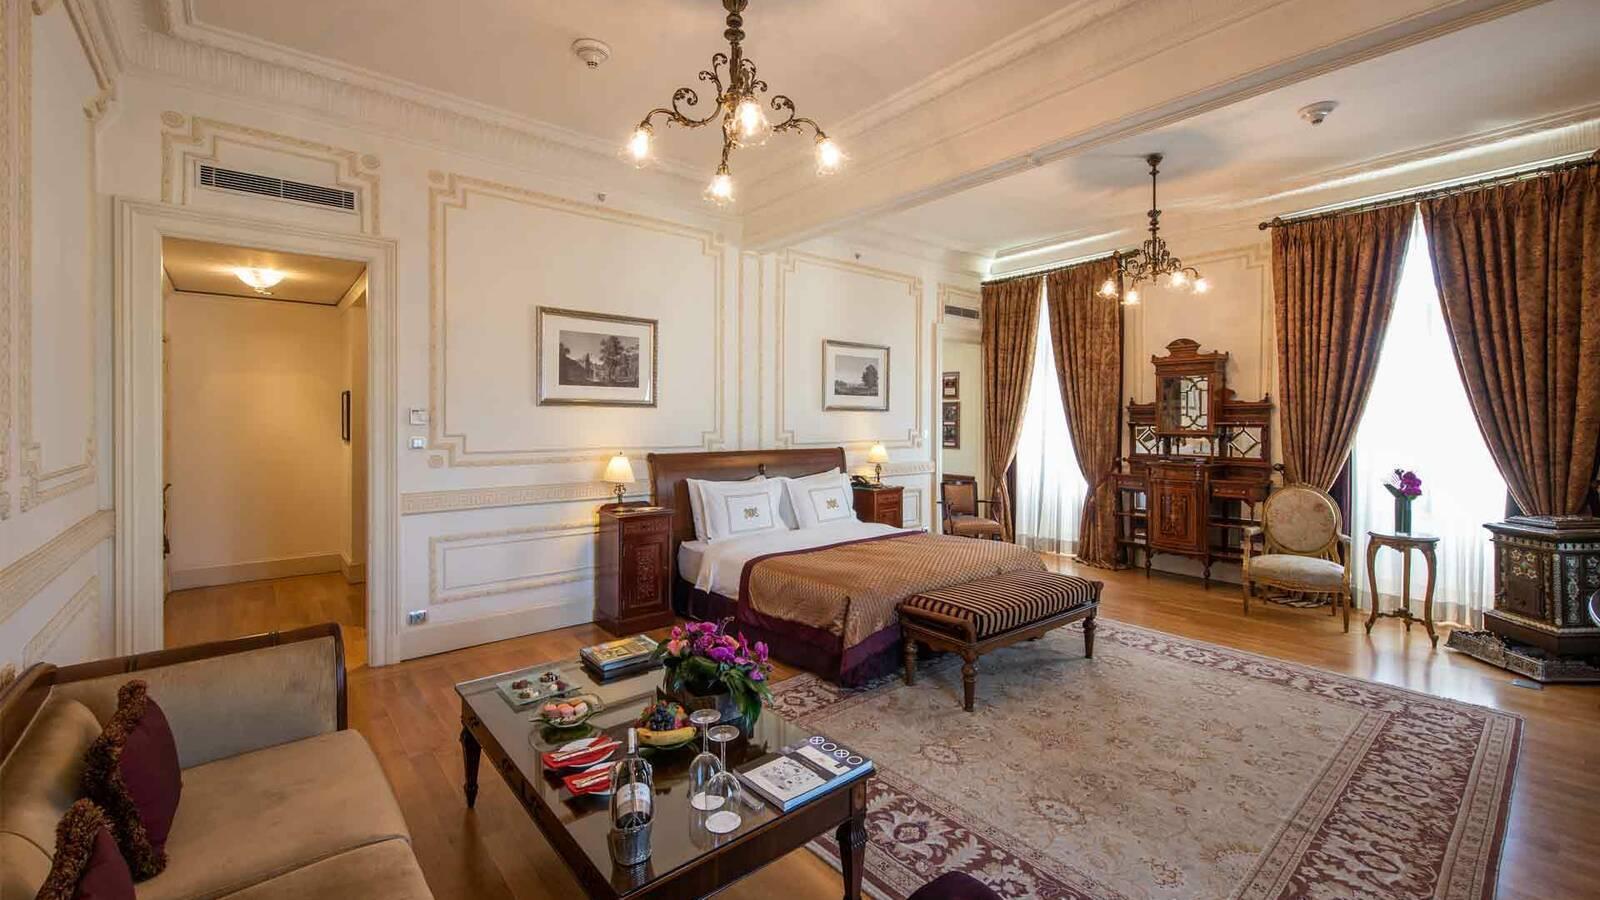 Turquie Pera Palace Suite Inonu